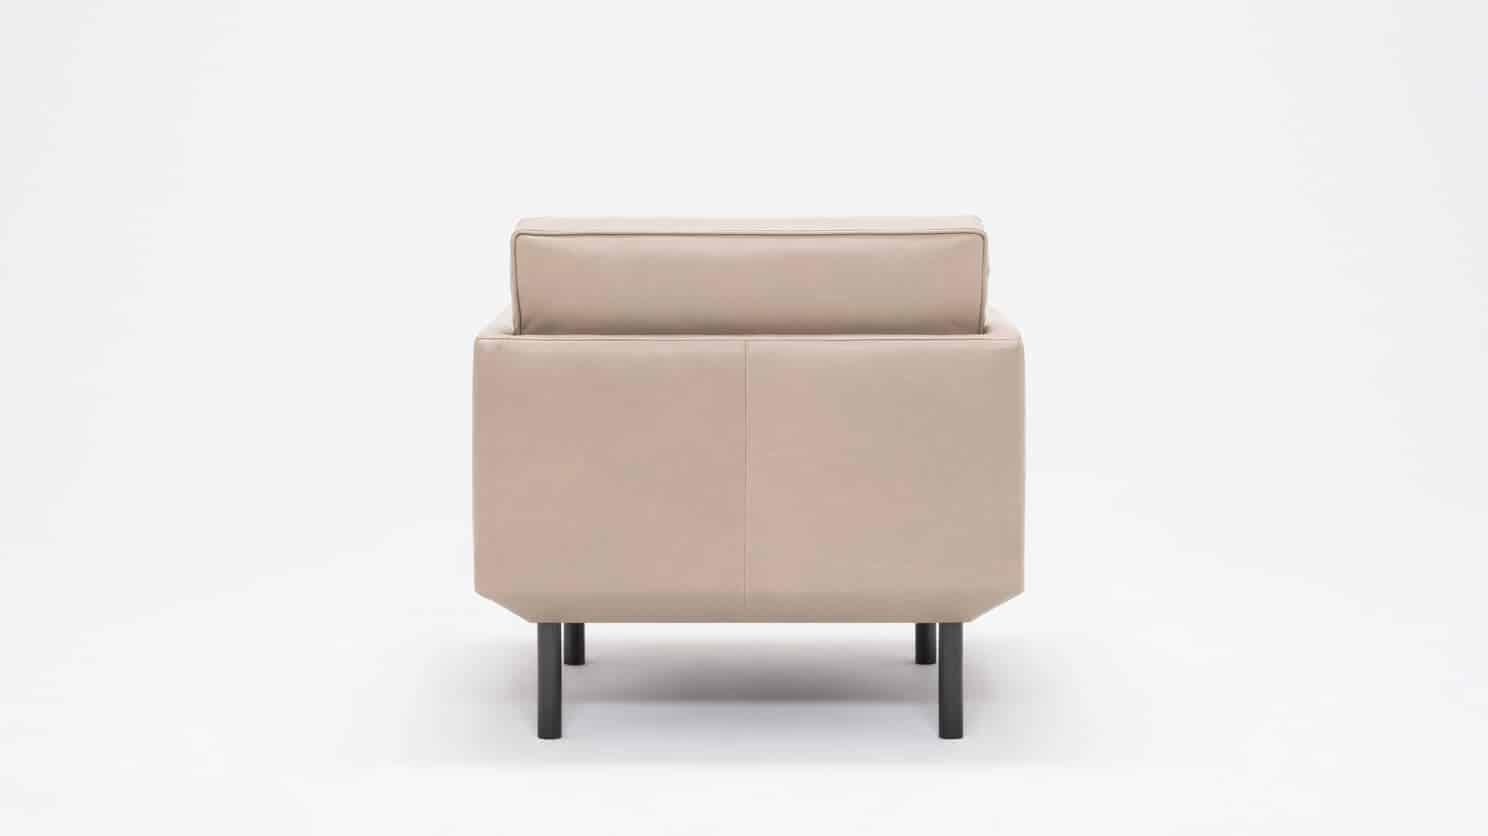 37155 95 par bp 5 chairs plateau club chair foam coachella warm grey back 01